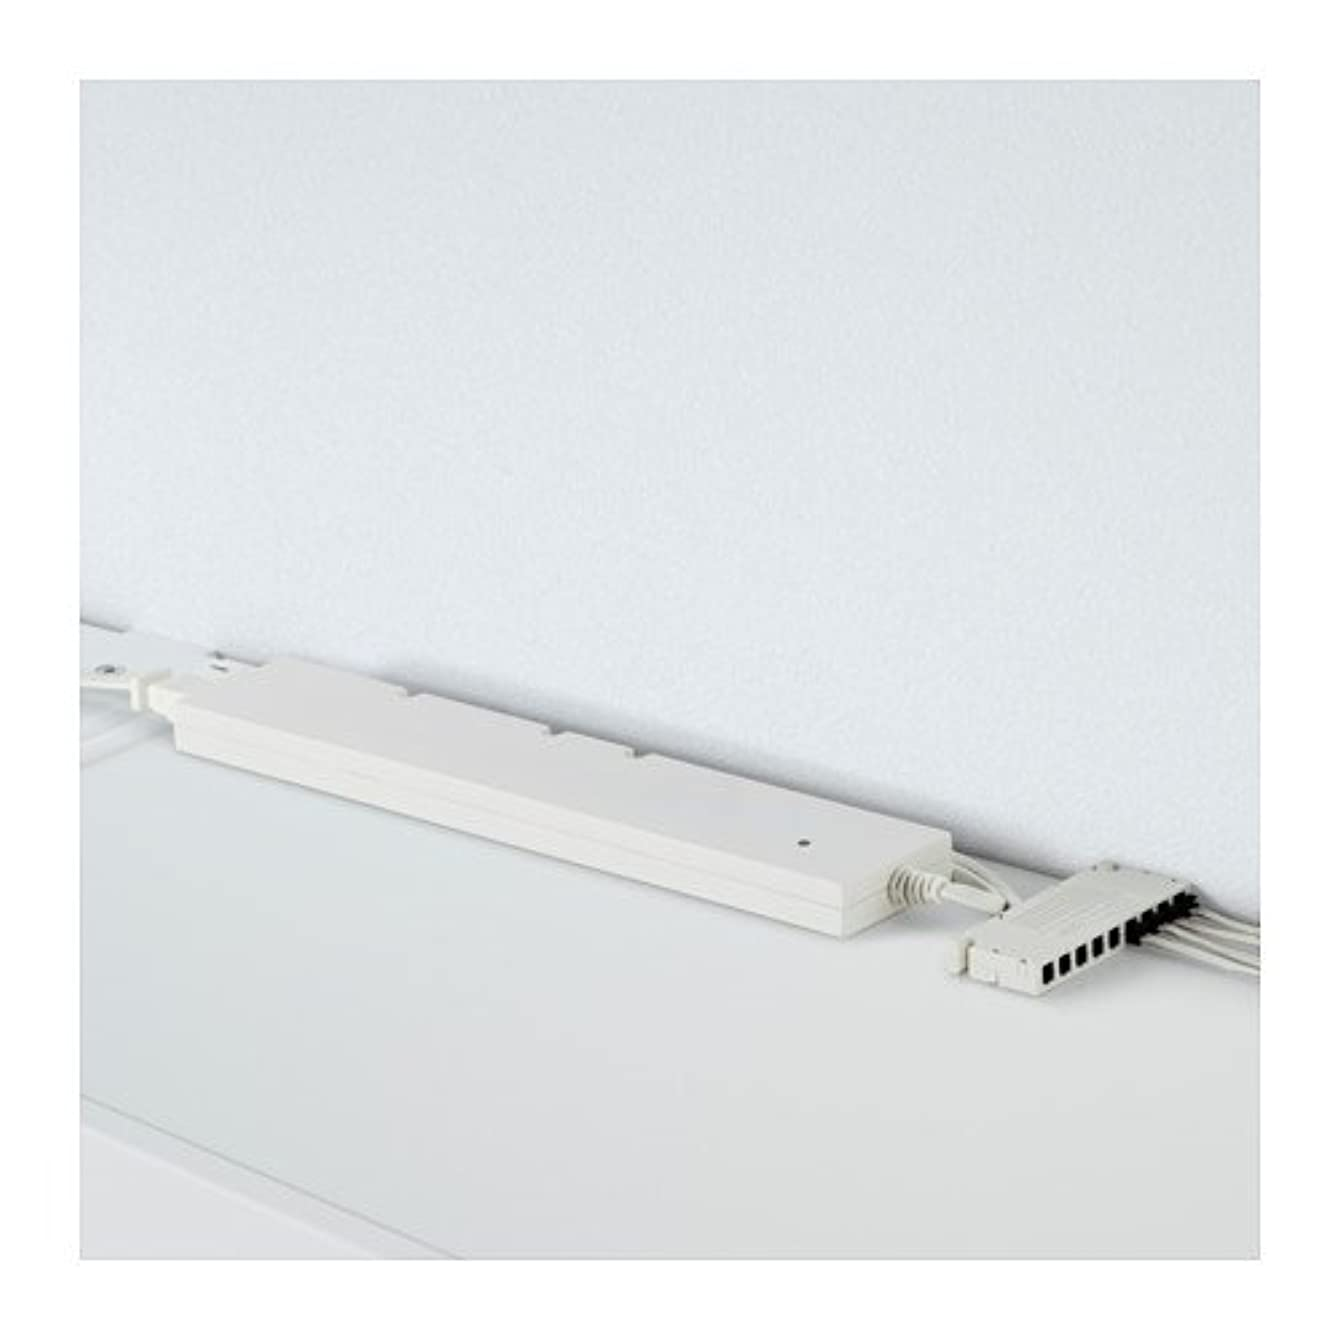 ANSLUTA Electronic transformer plus ANSLUTA Power supply cord.